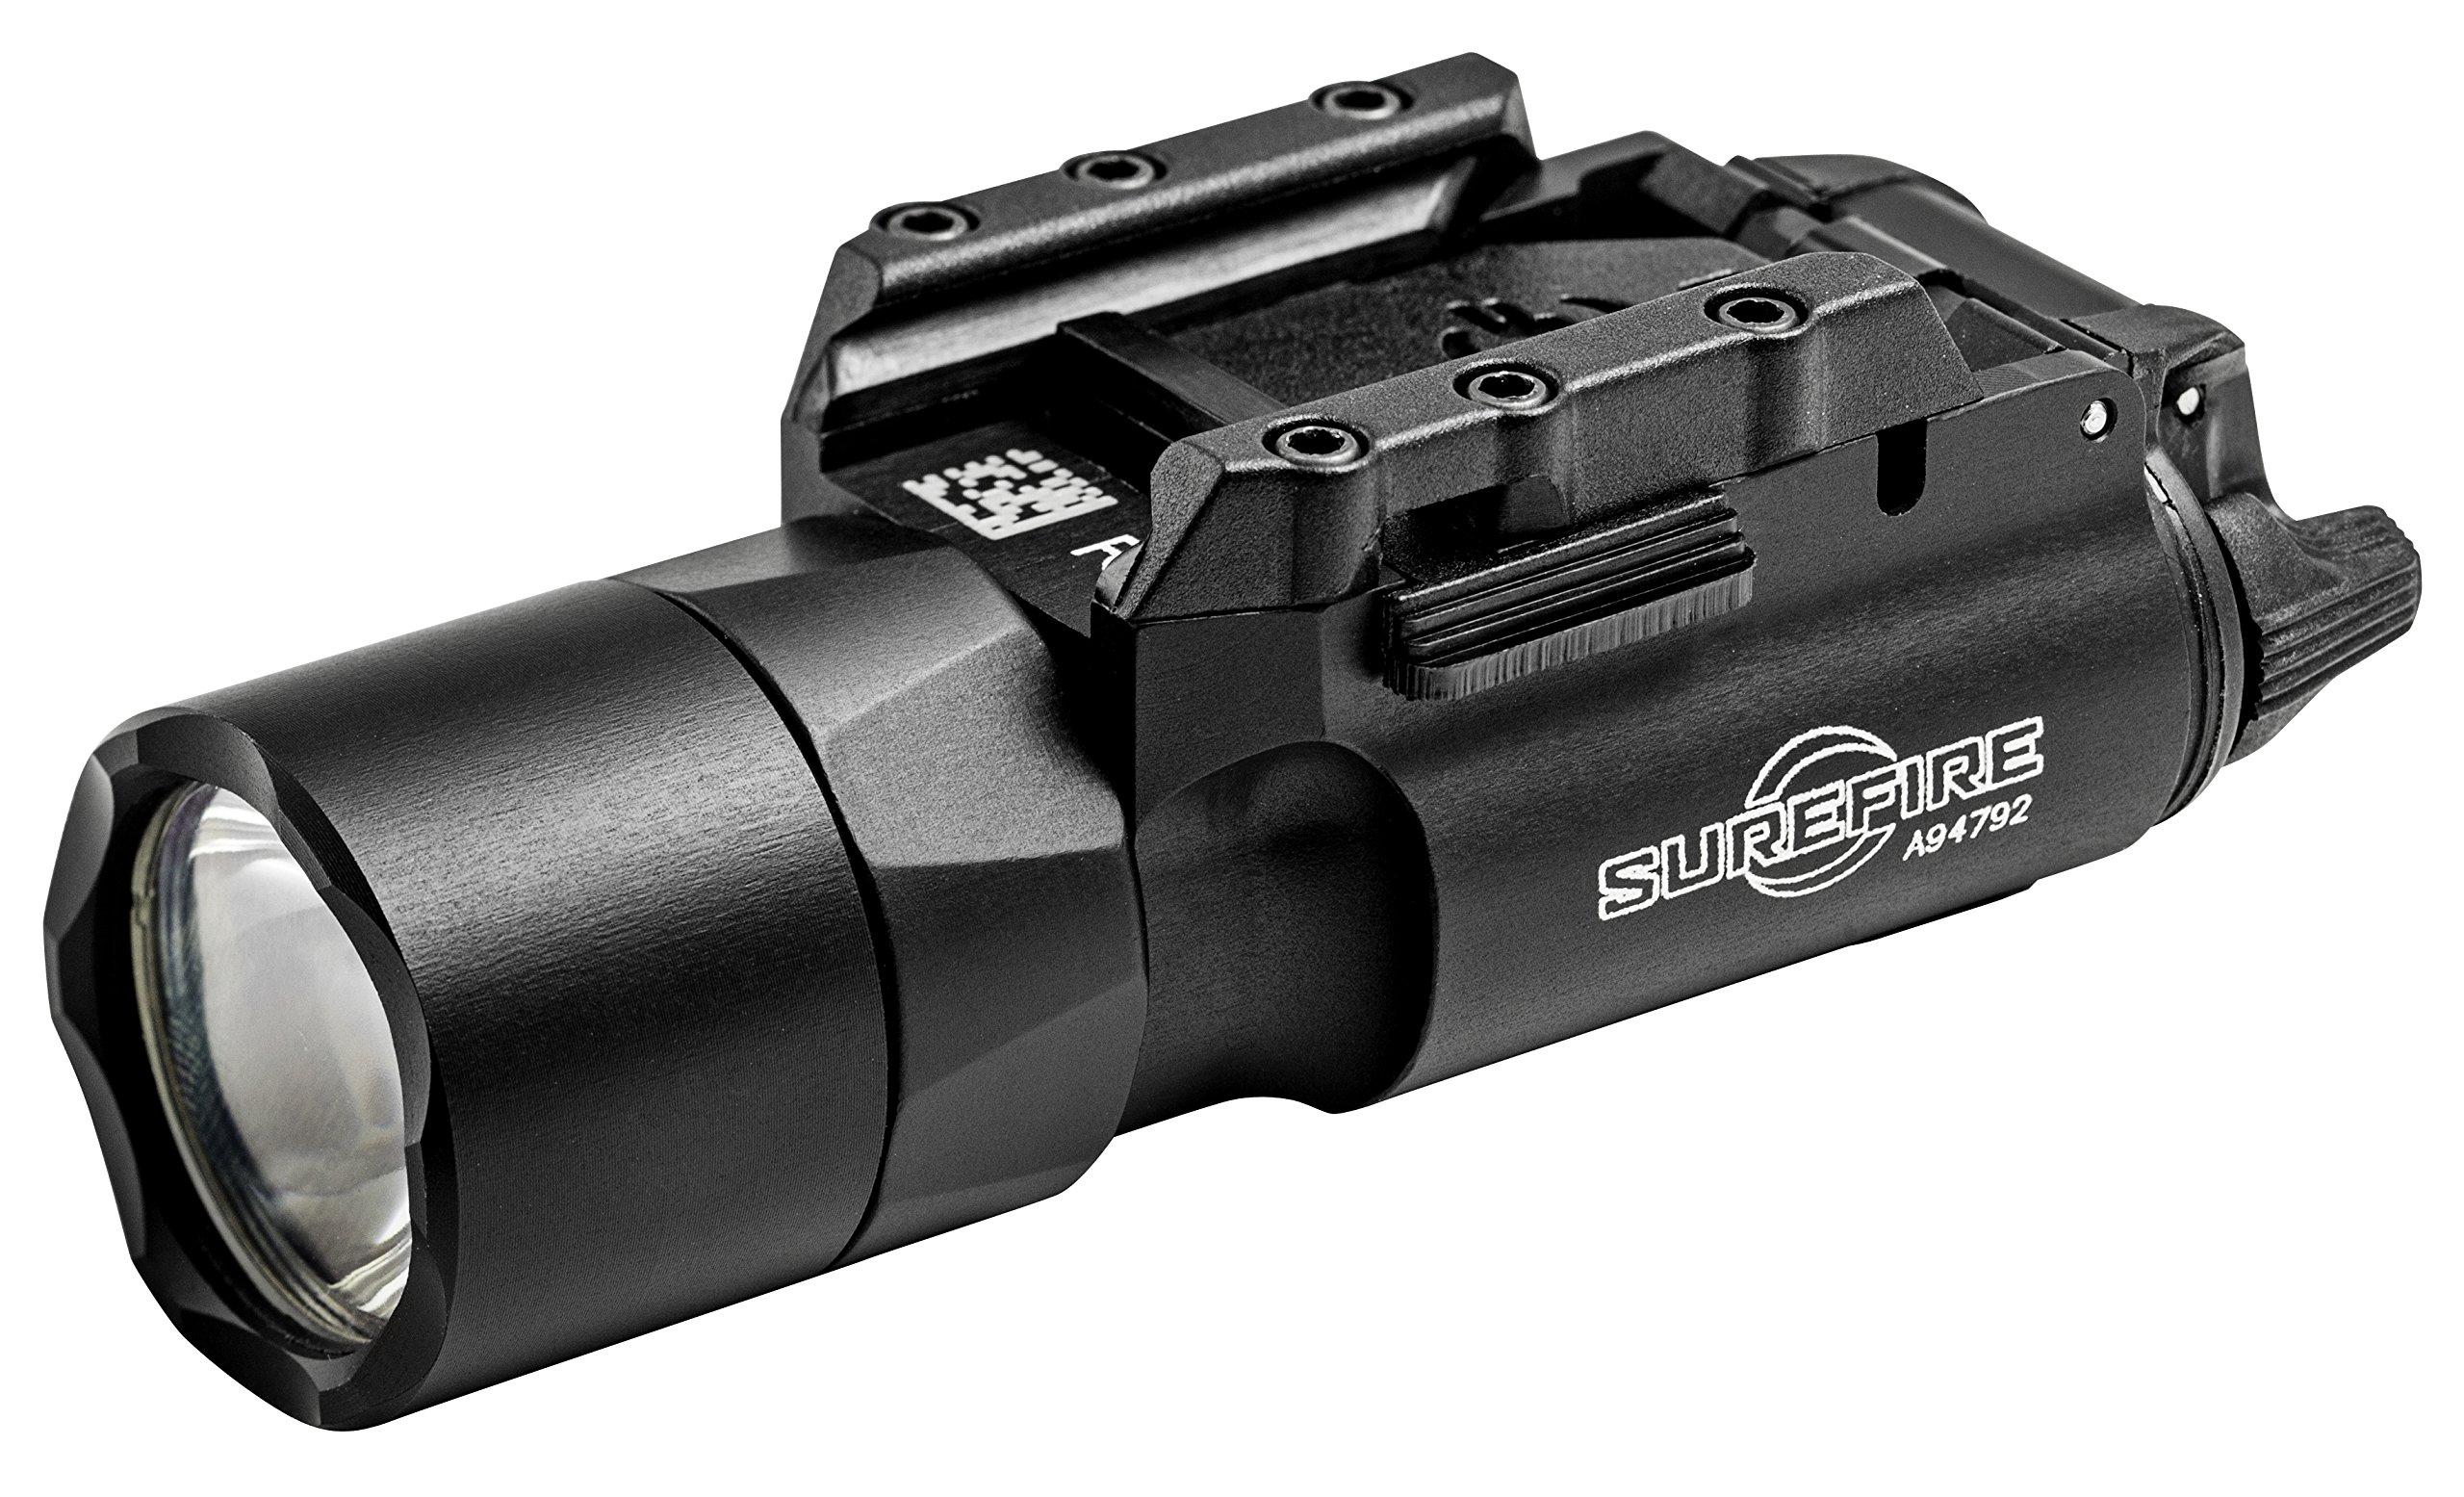 SureFire X300 Ultra LED Handgun or Long Gun WeaponLight with Rail-Lock Mount, Black by SureFire